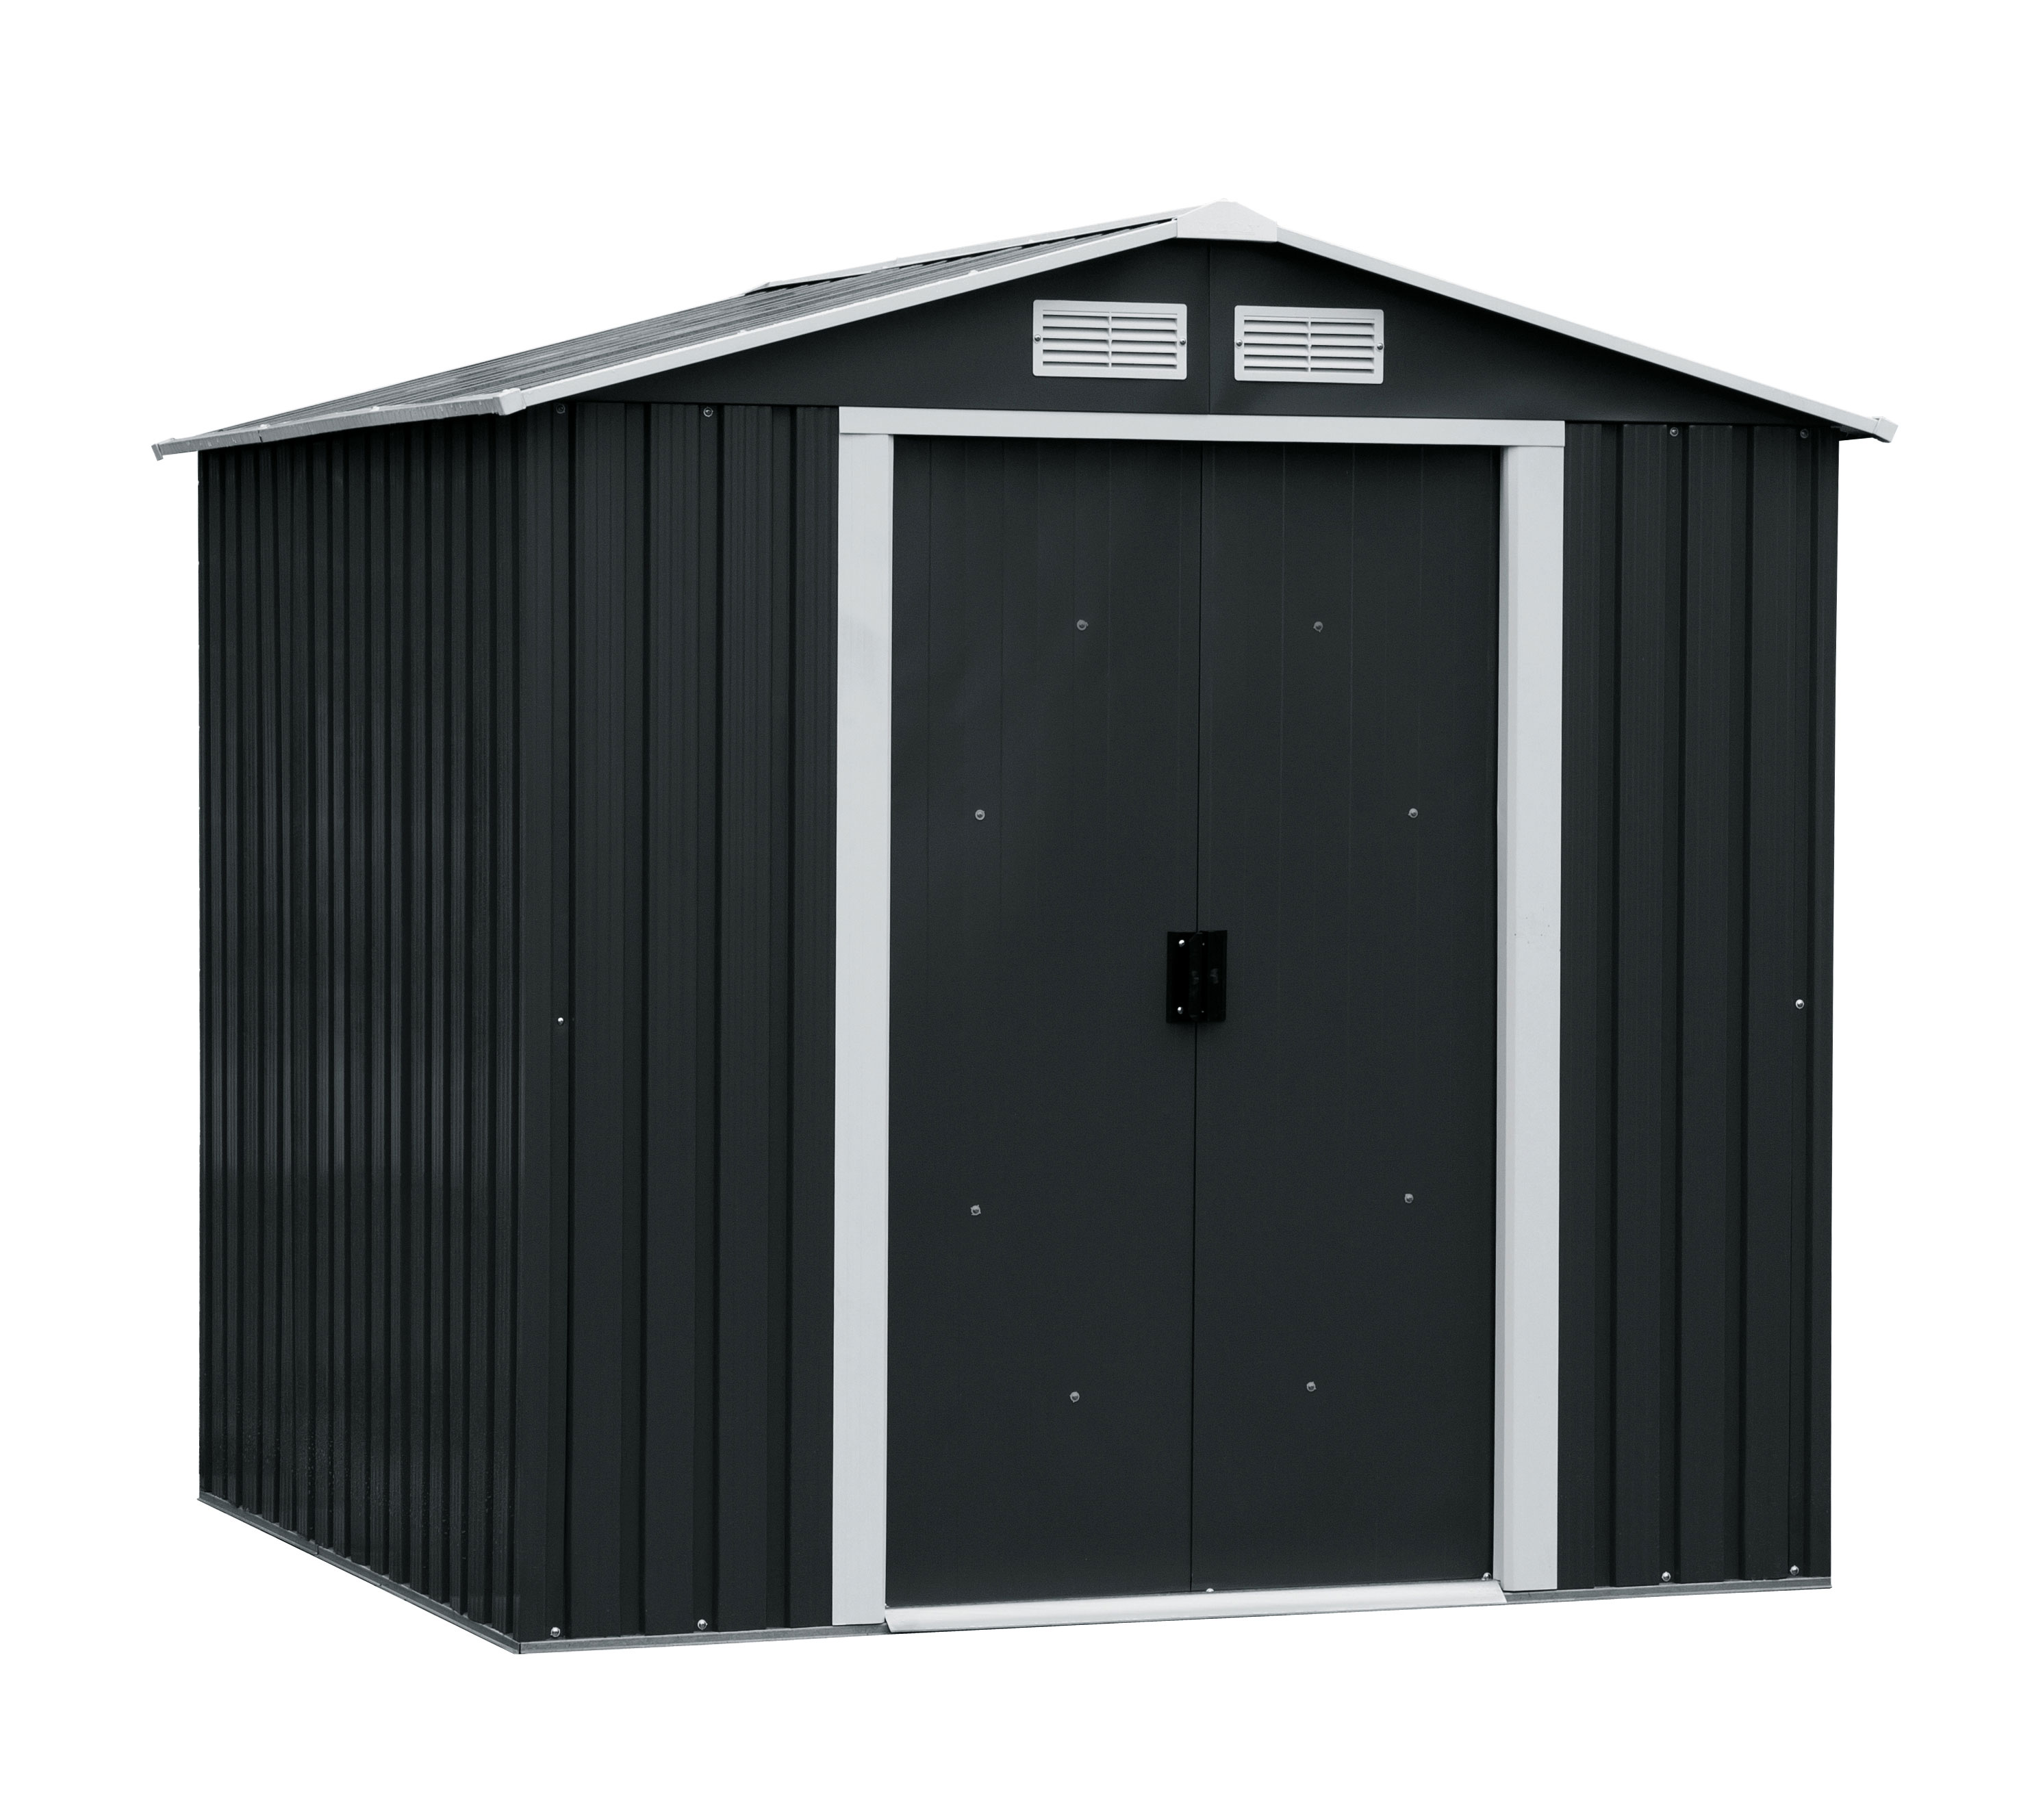 duramax ger tehaus metall riverton 6x4 anthrazit 201x122. Black Bedroom Furniture Sets. Home Design Ideas